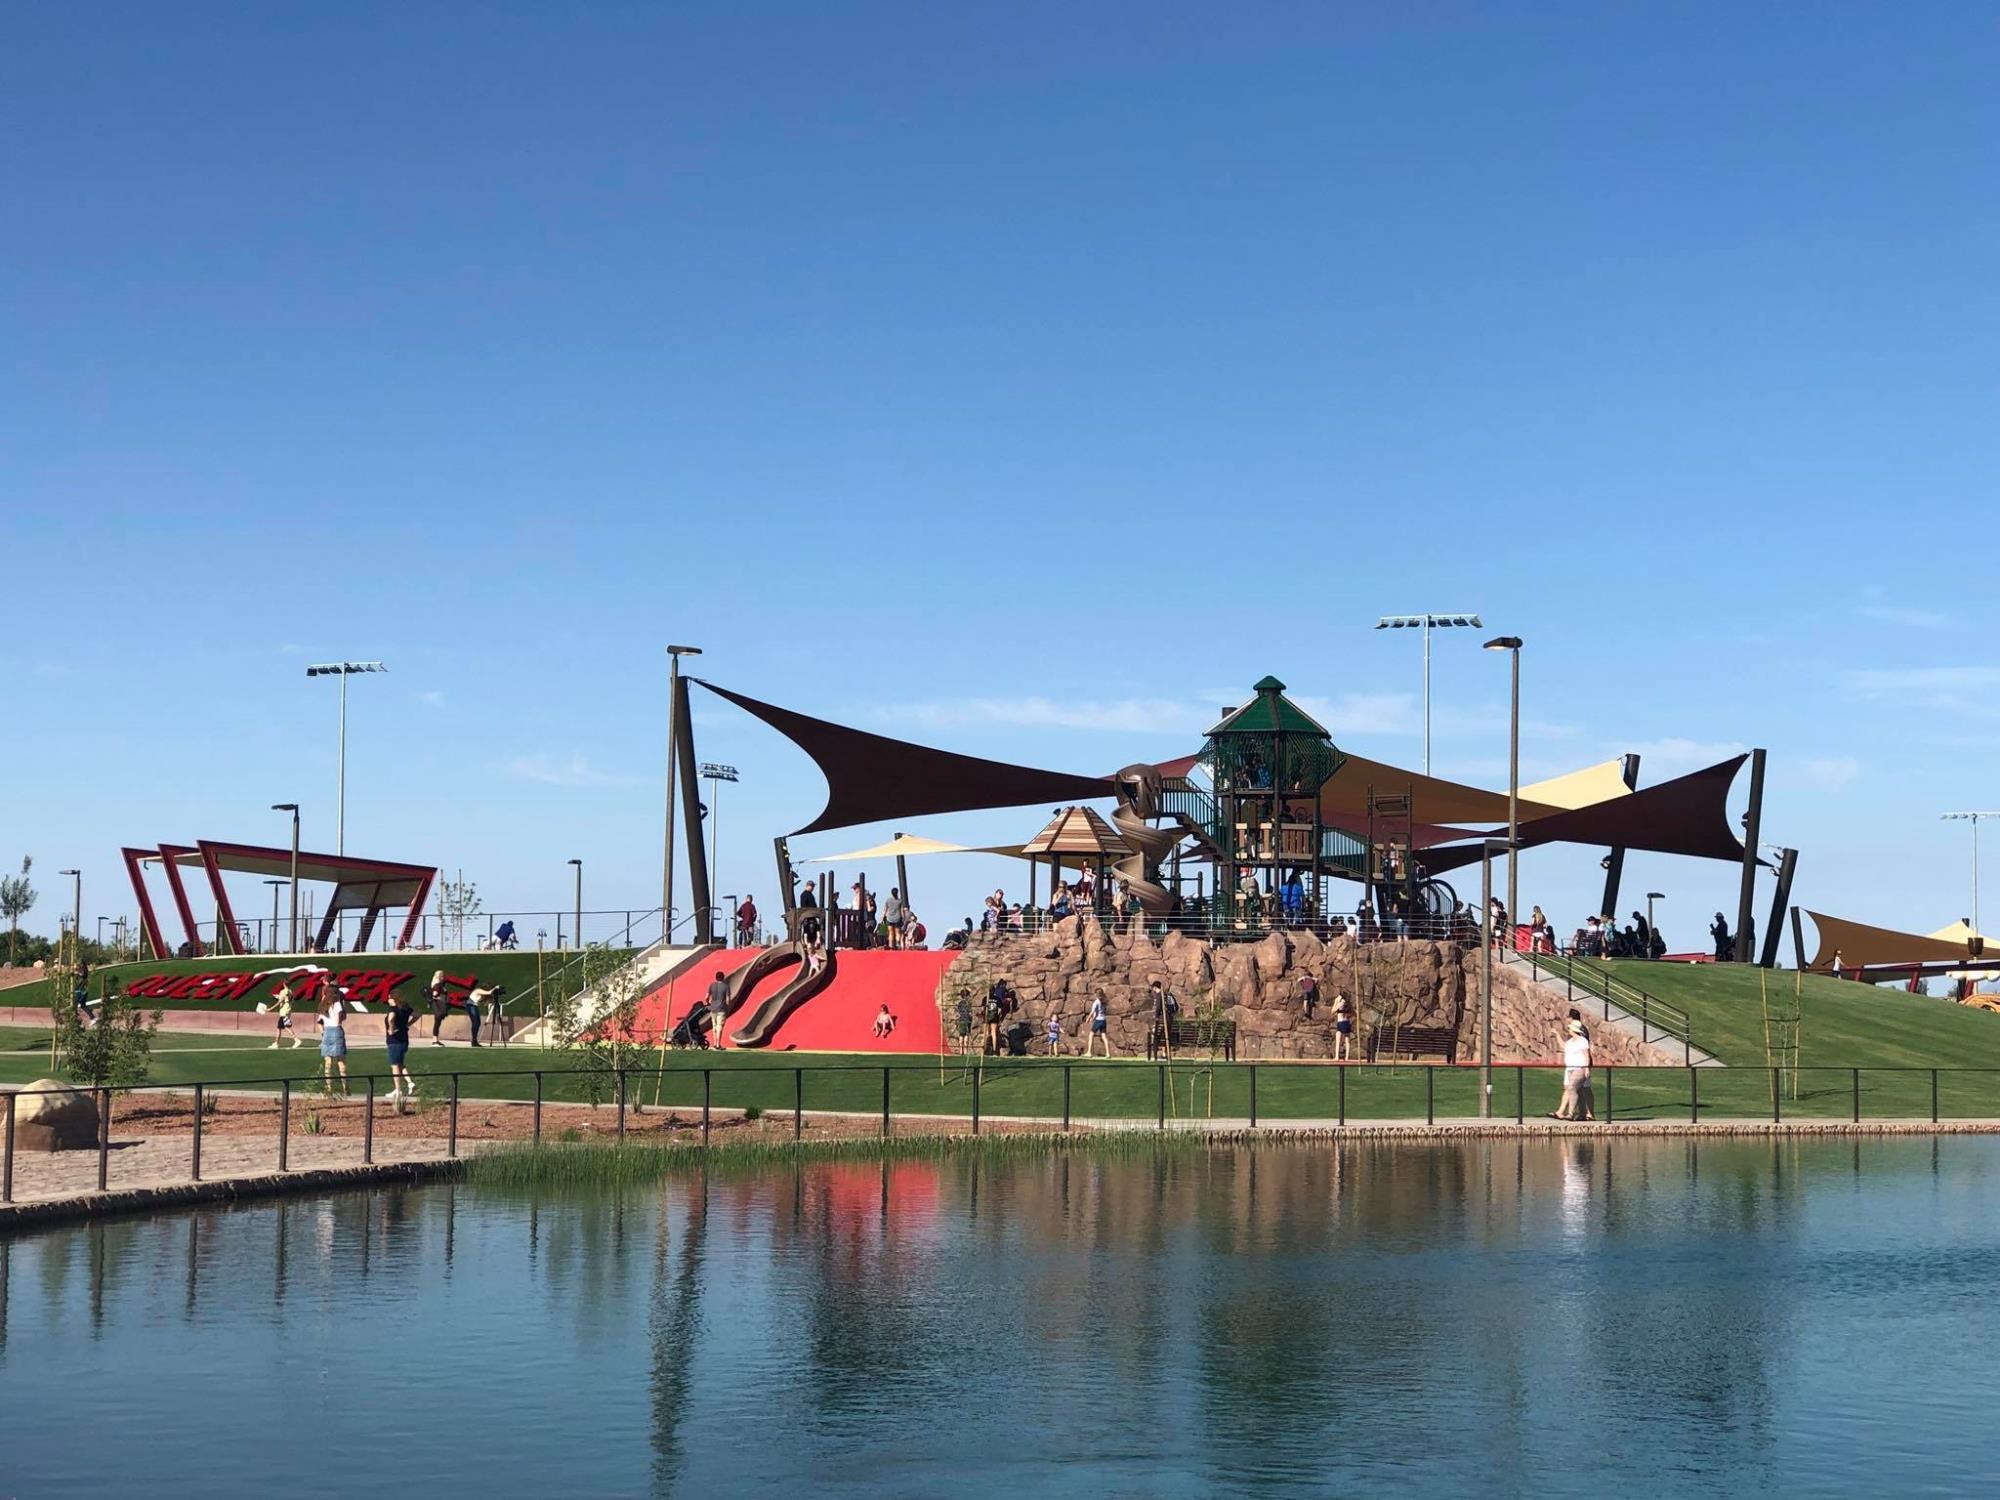 Mansel Park